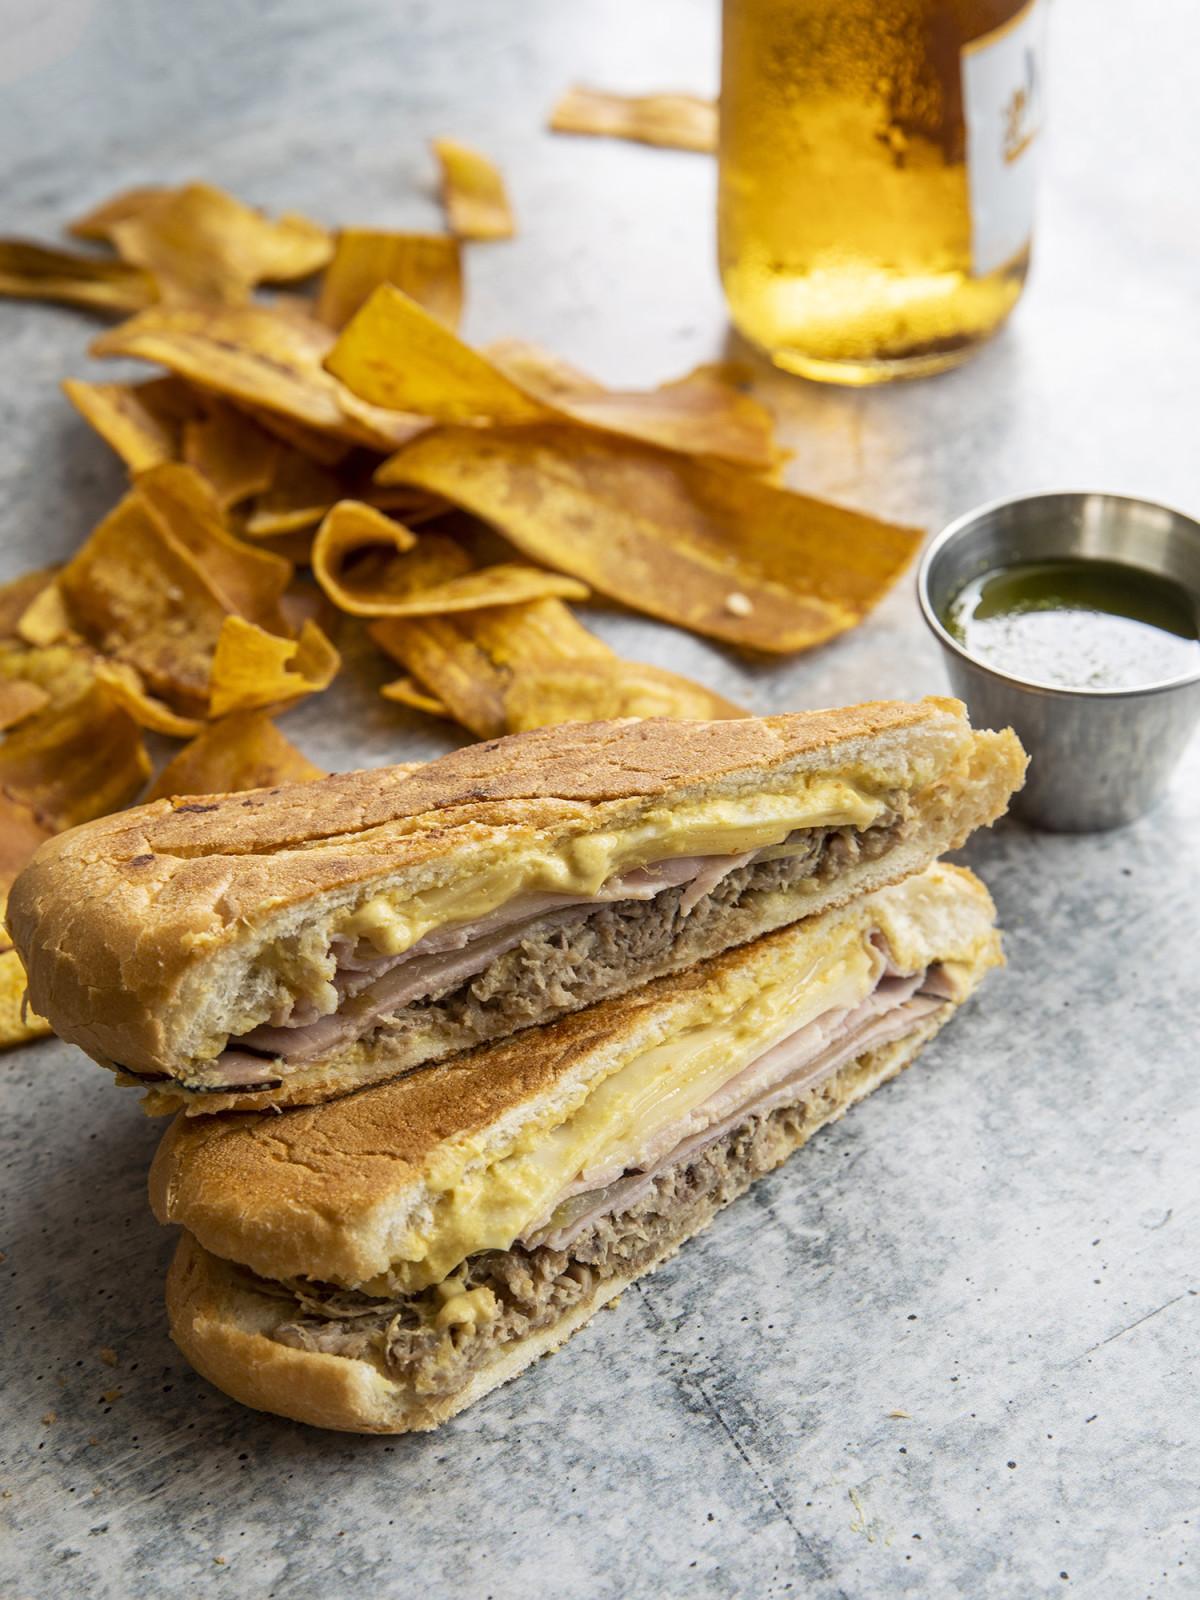 Tropicales cubano sandwich